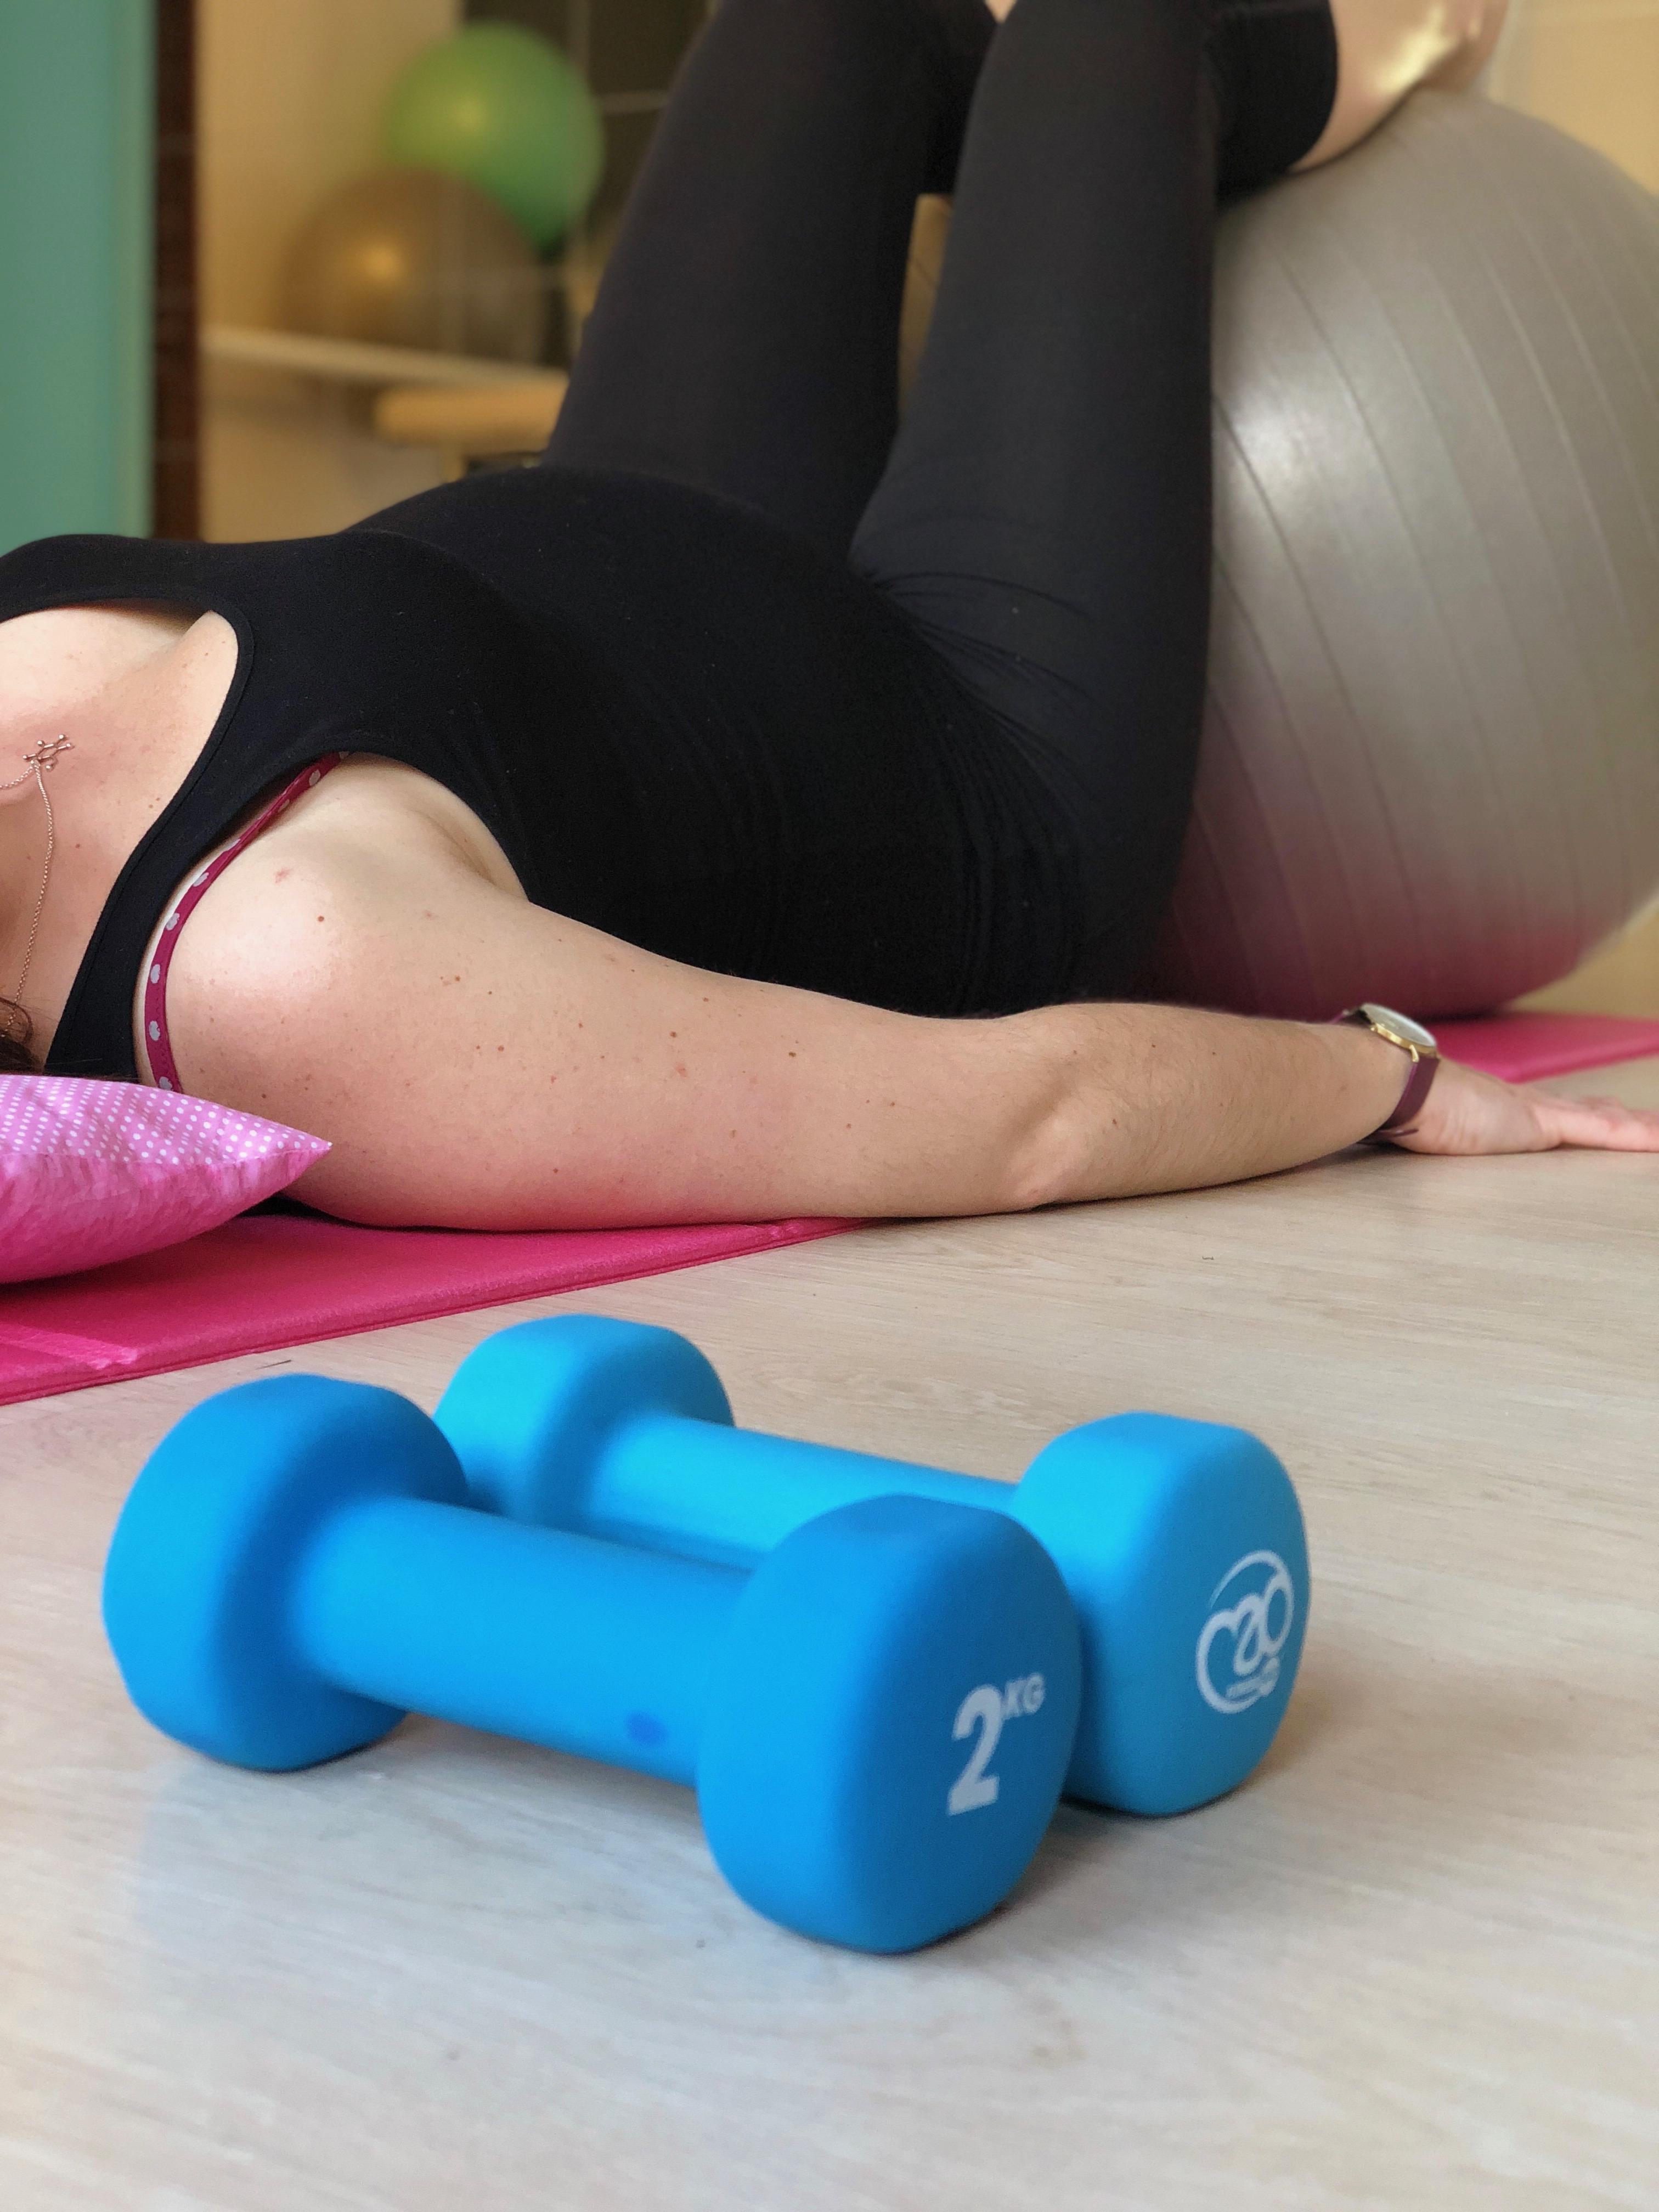 Exercicis de sòl pèlvic durant l'embaràs